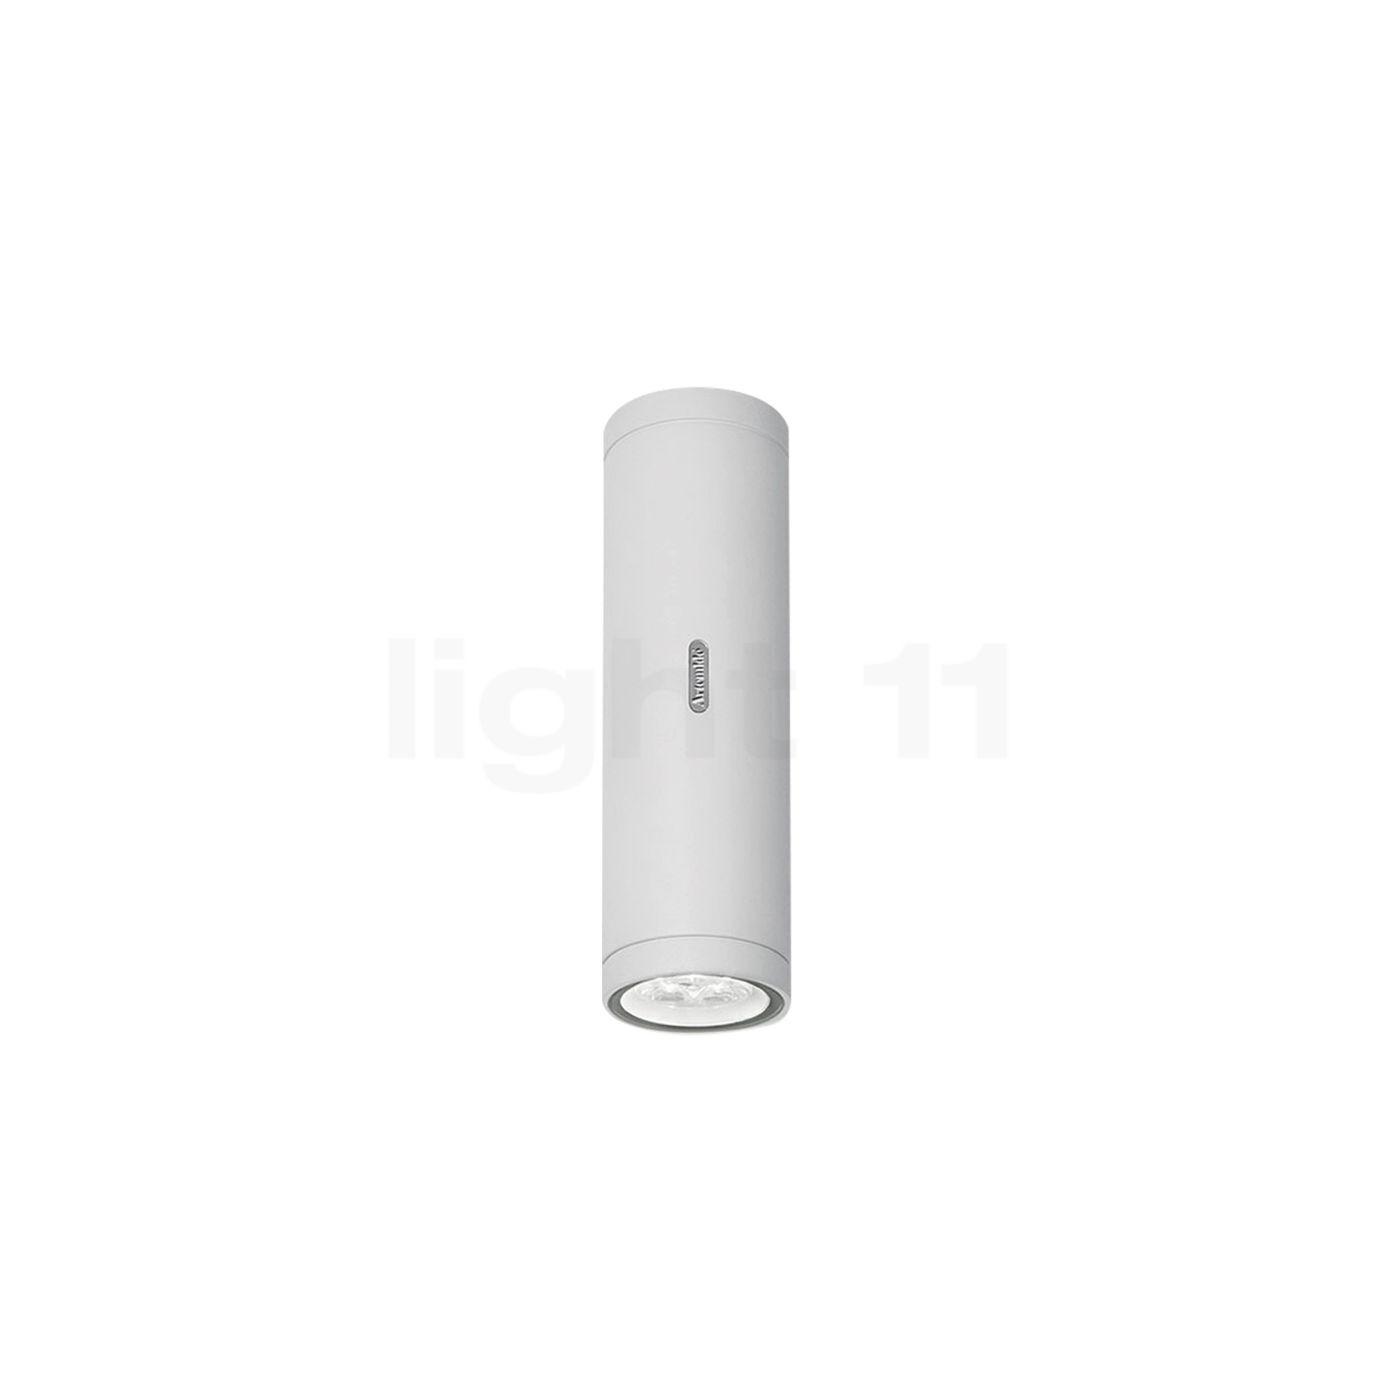 Artemide Calumet Wandleuchte LED, weiß, 25 cm T41911NW00